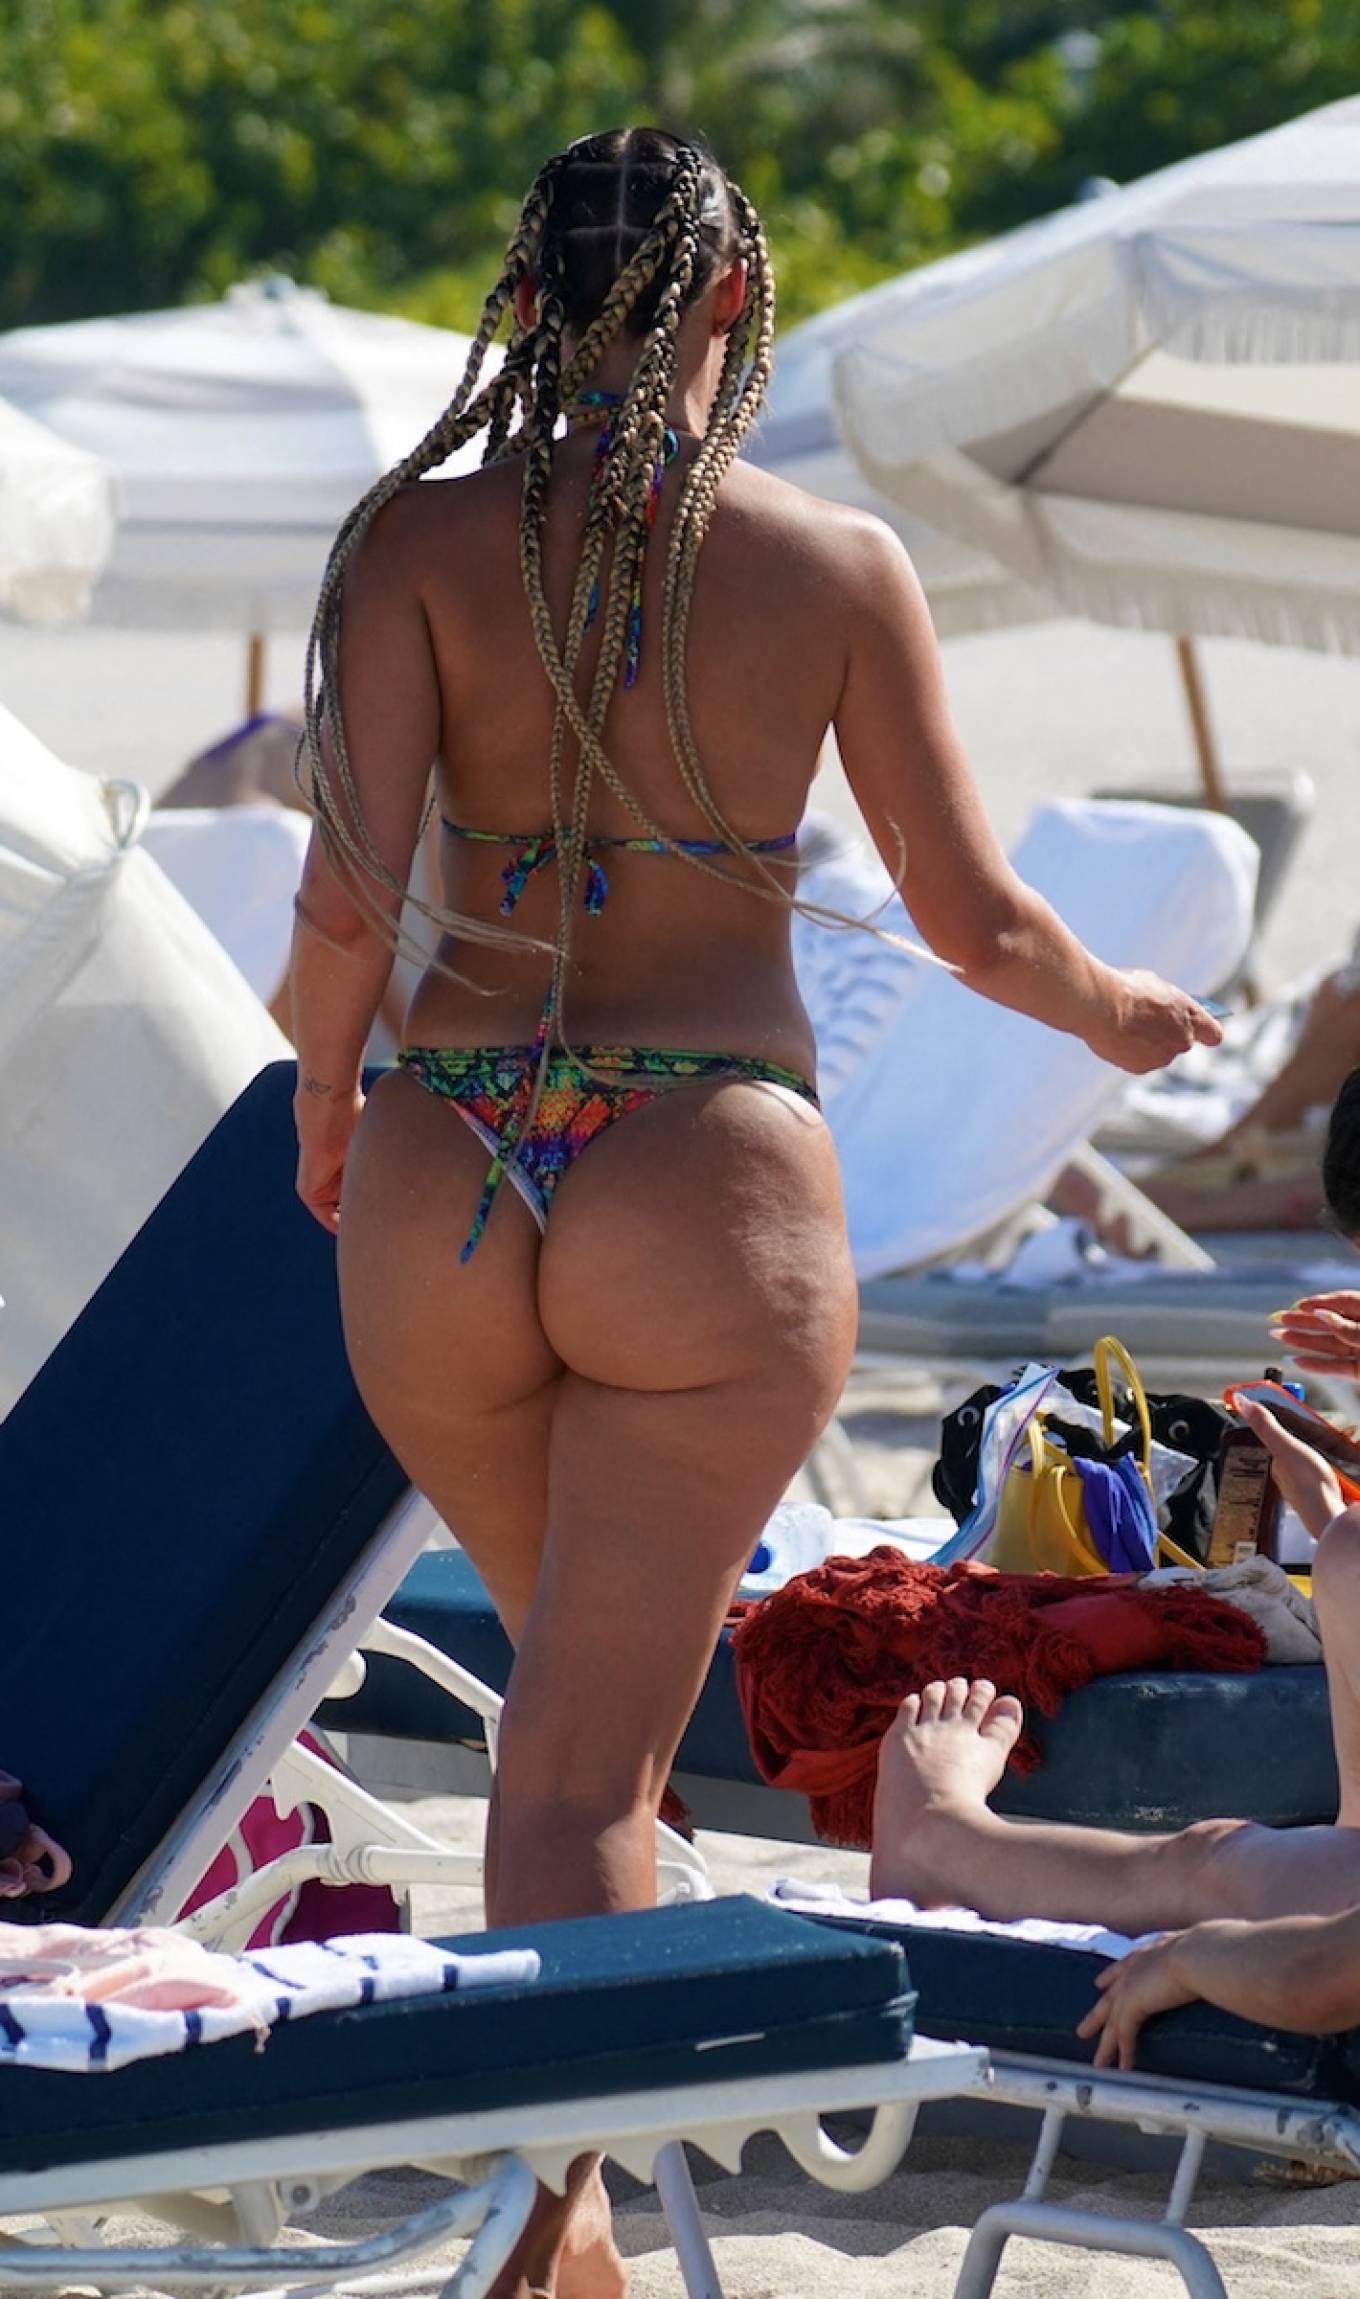 YesJulz 2021 : YesJulz – In a bikini at the beach -10